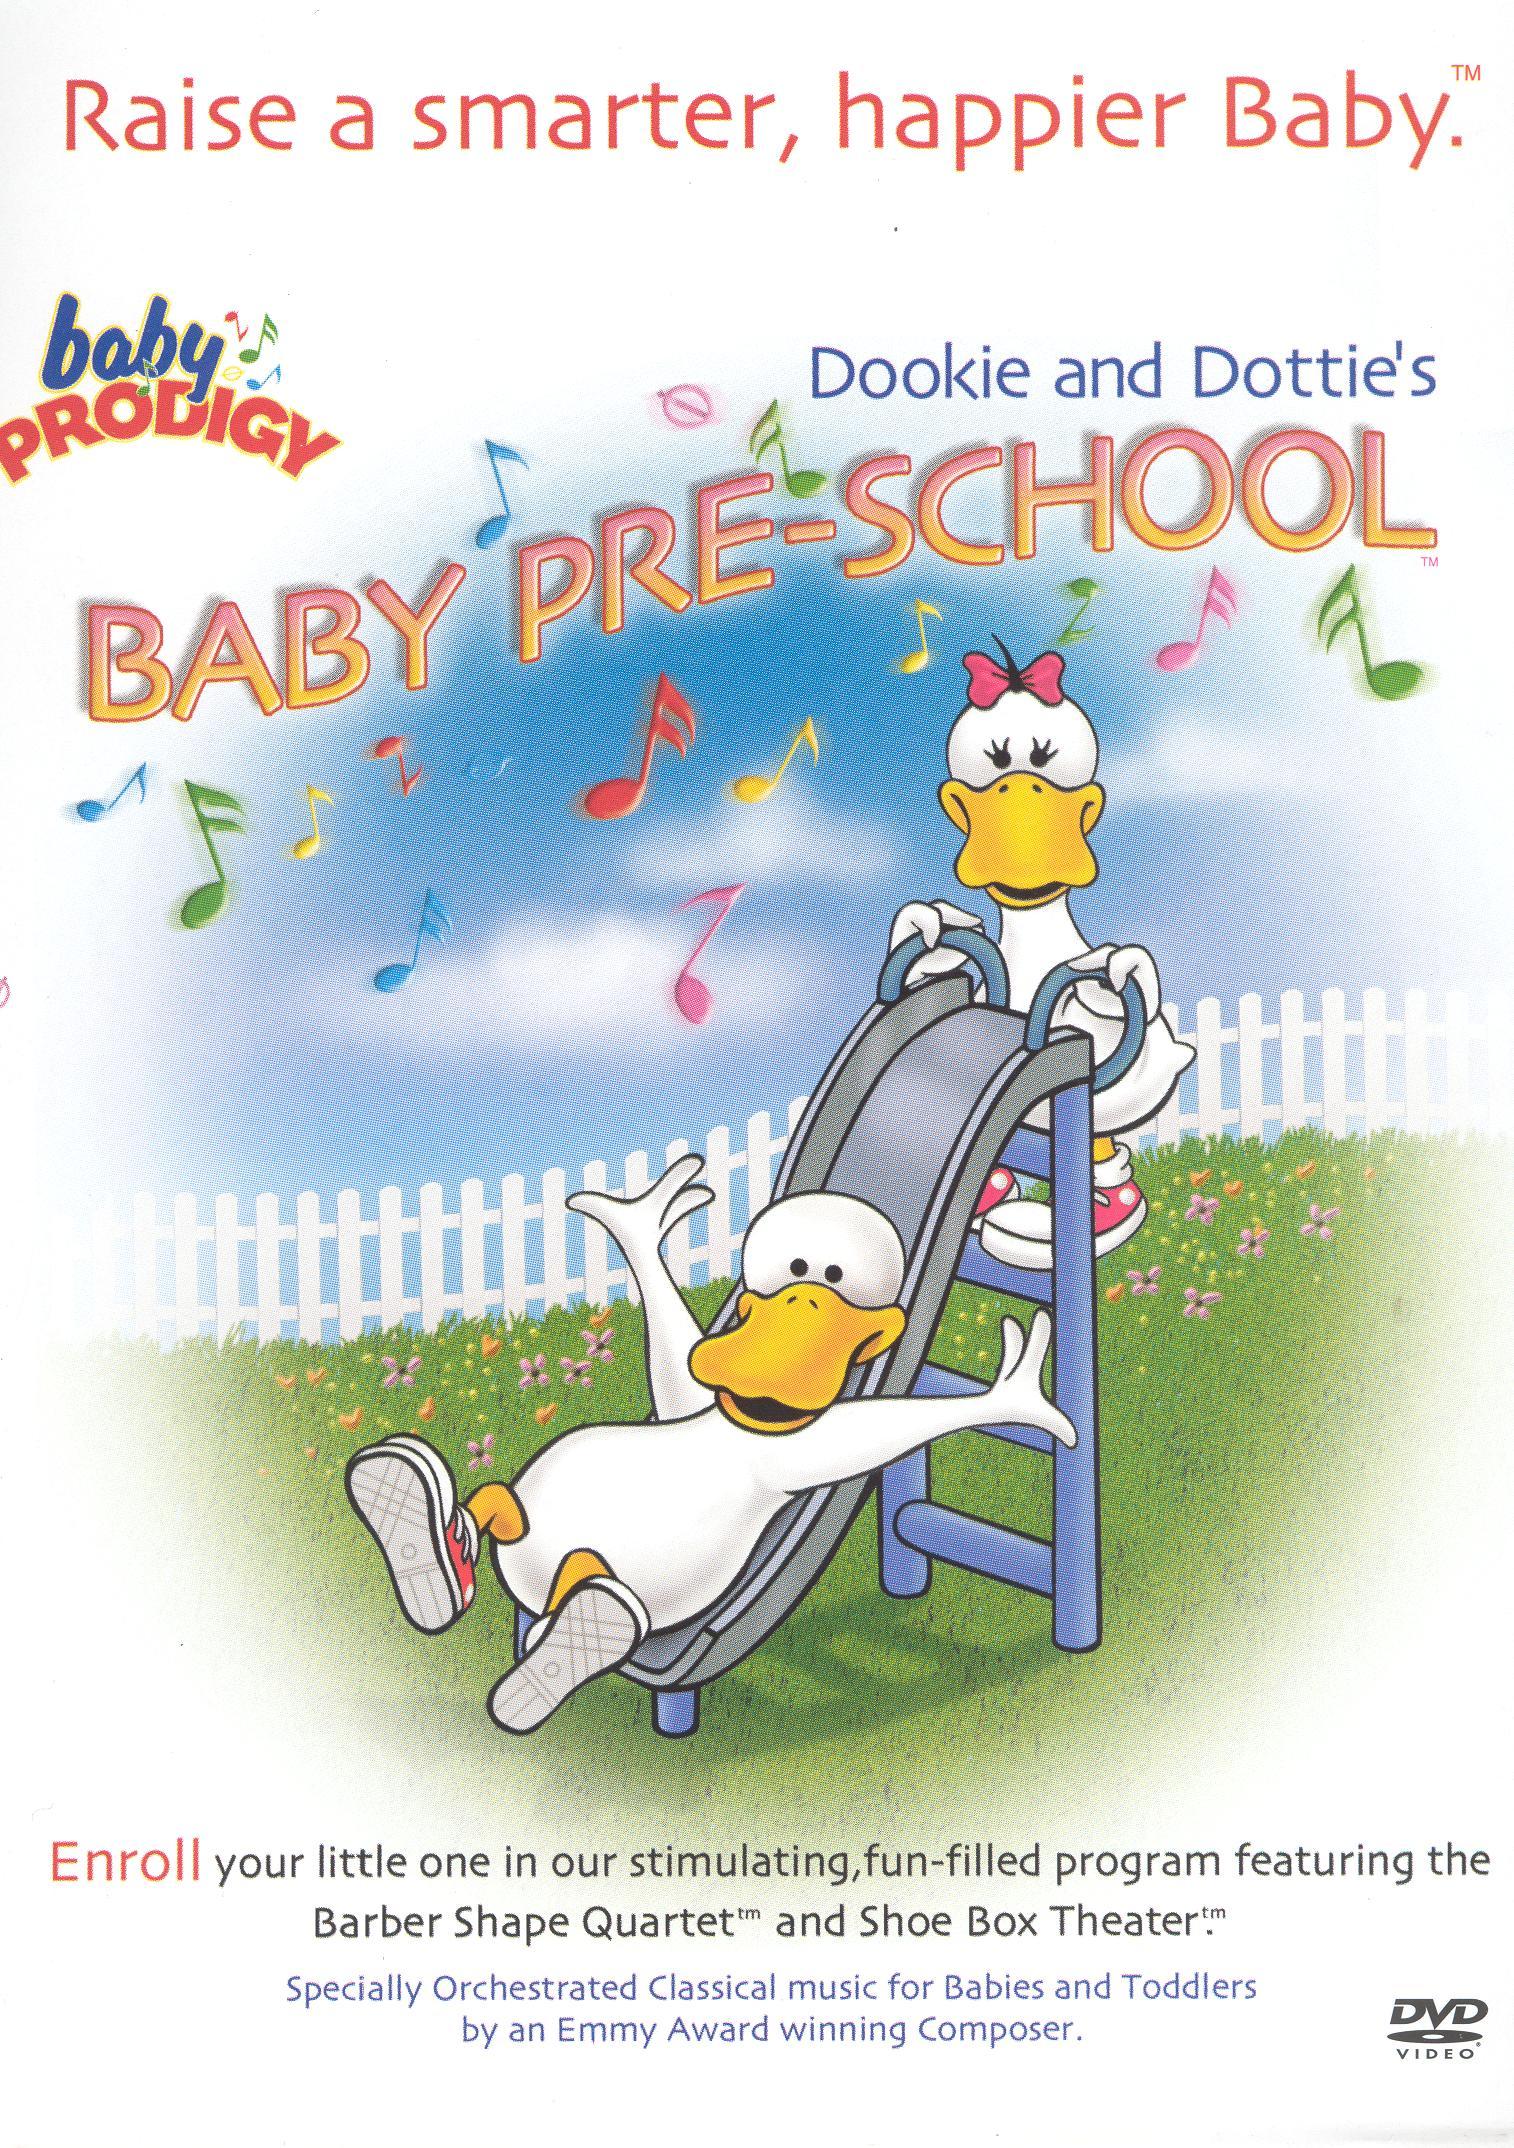 Baby Prodigy: Dookie and Dottie's Baby Pre-School